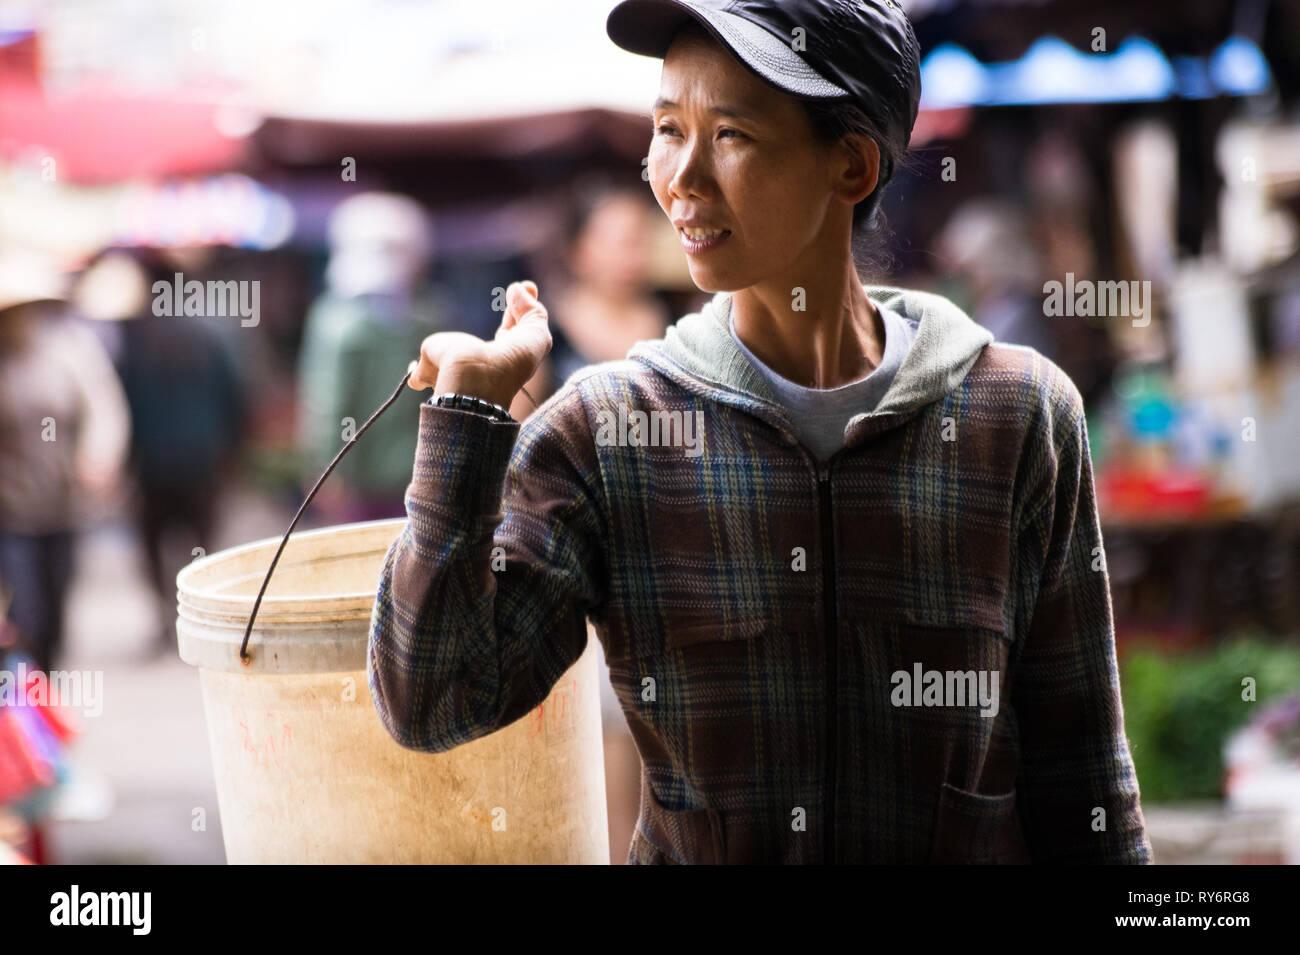 Vietnamese Woman Carrying a Bucket in Hoi An Market, Vietnam - Stock Image